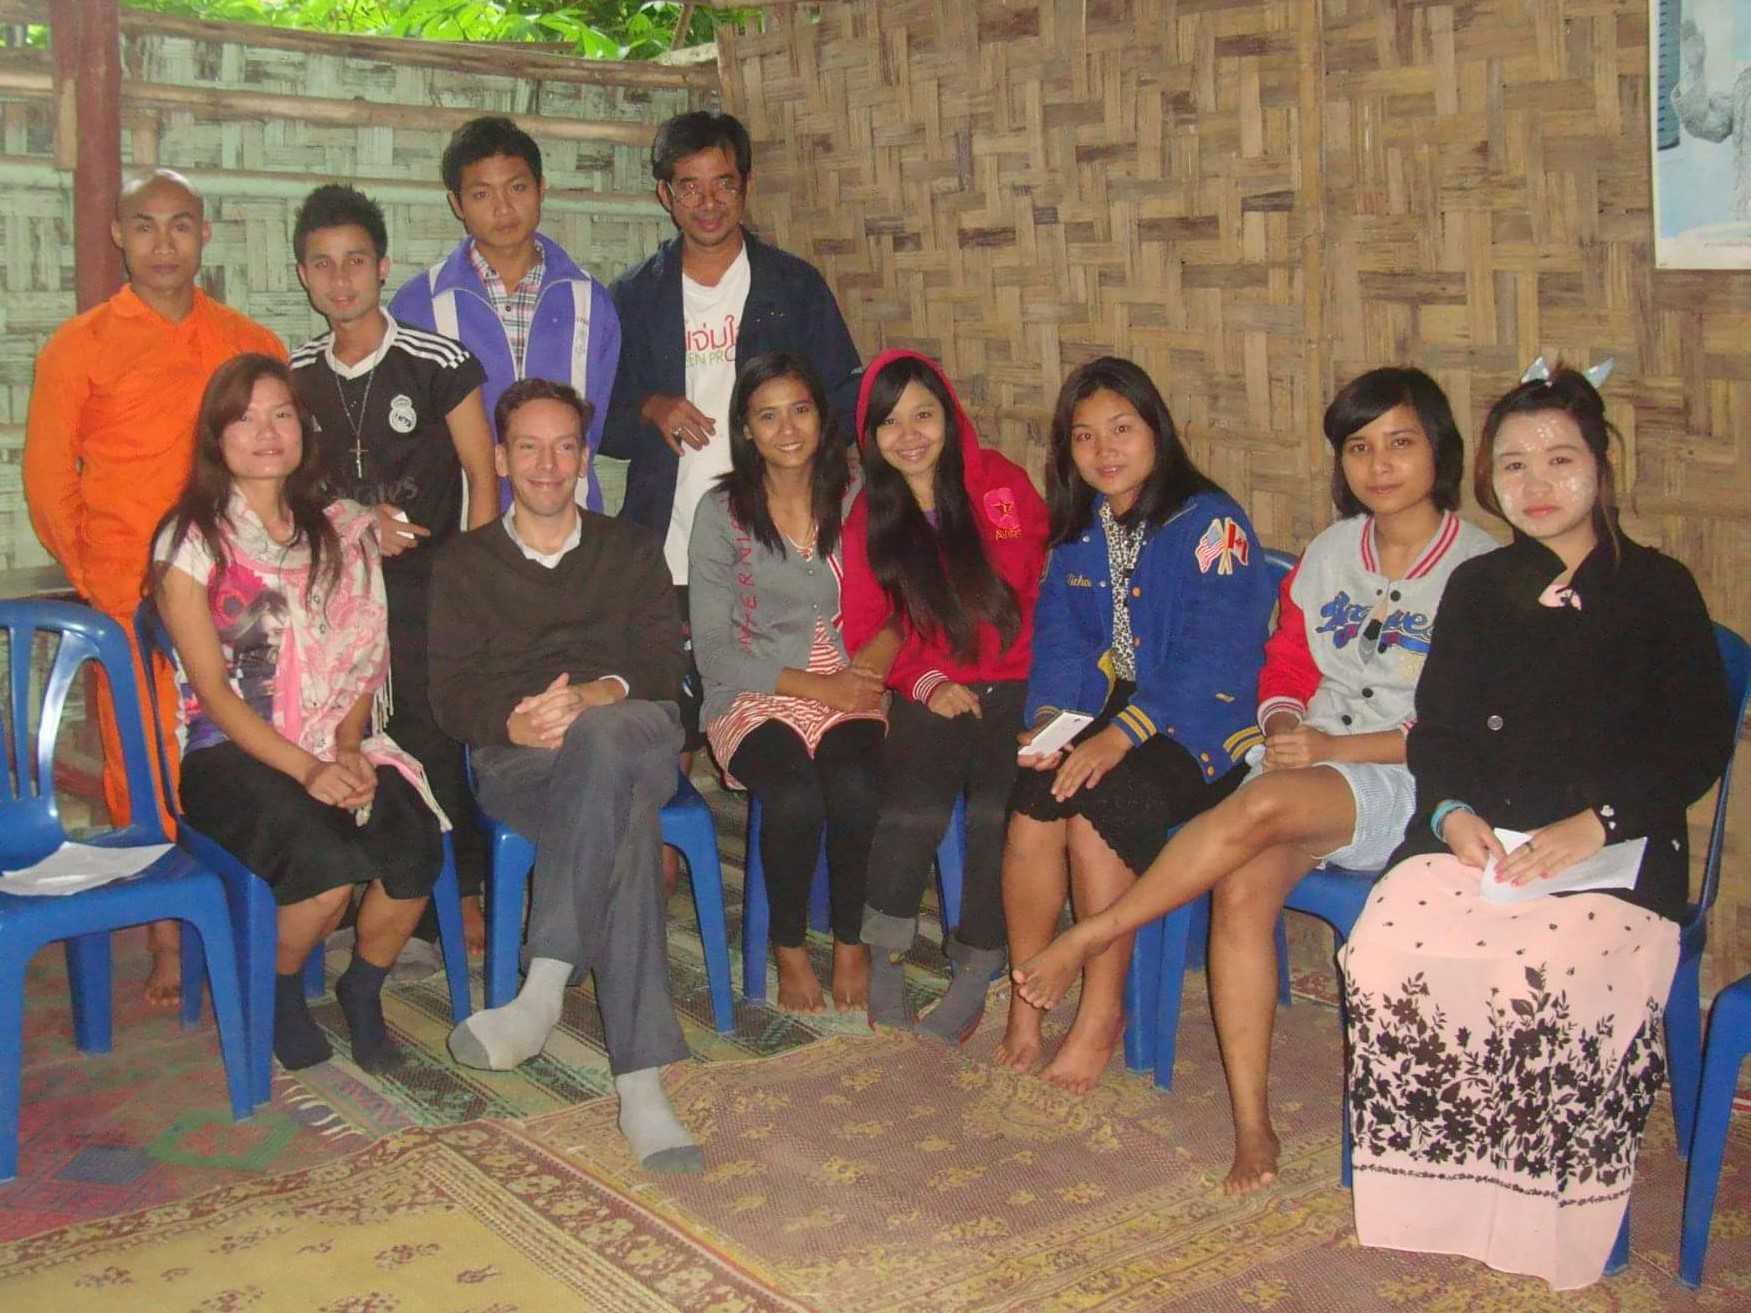 Making Merit at a Burmese Refugee Camp